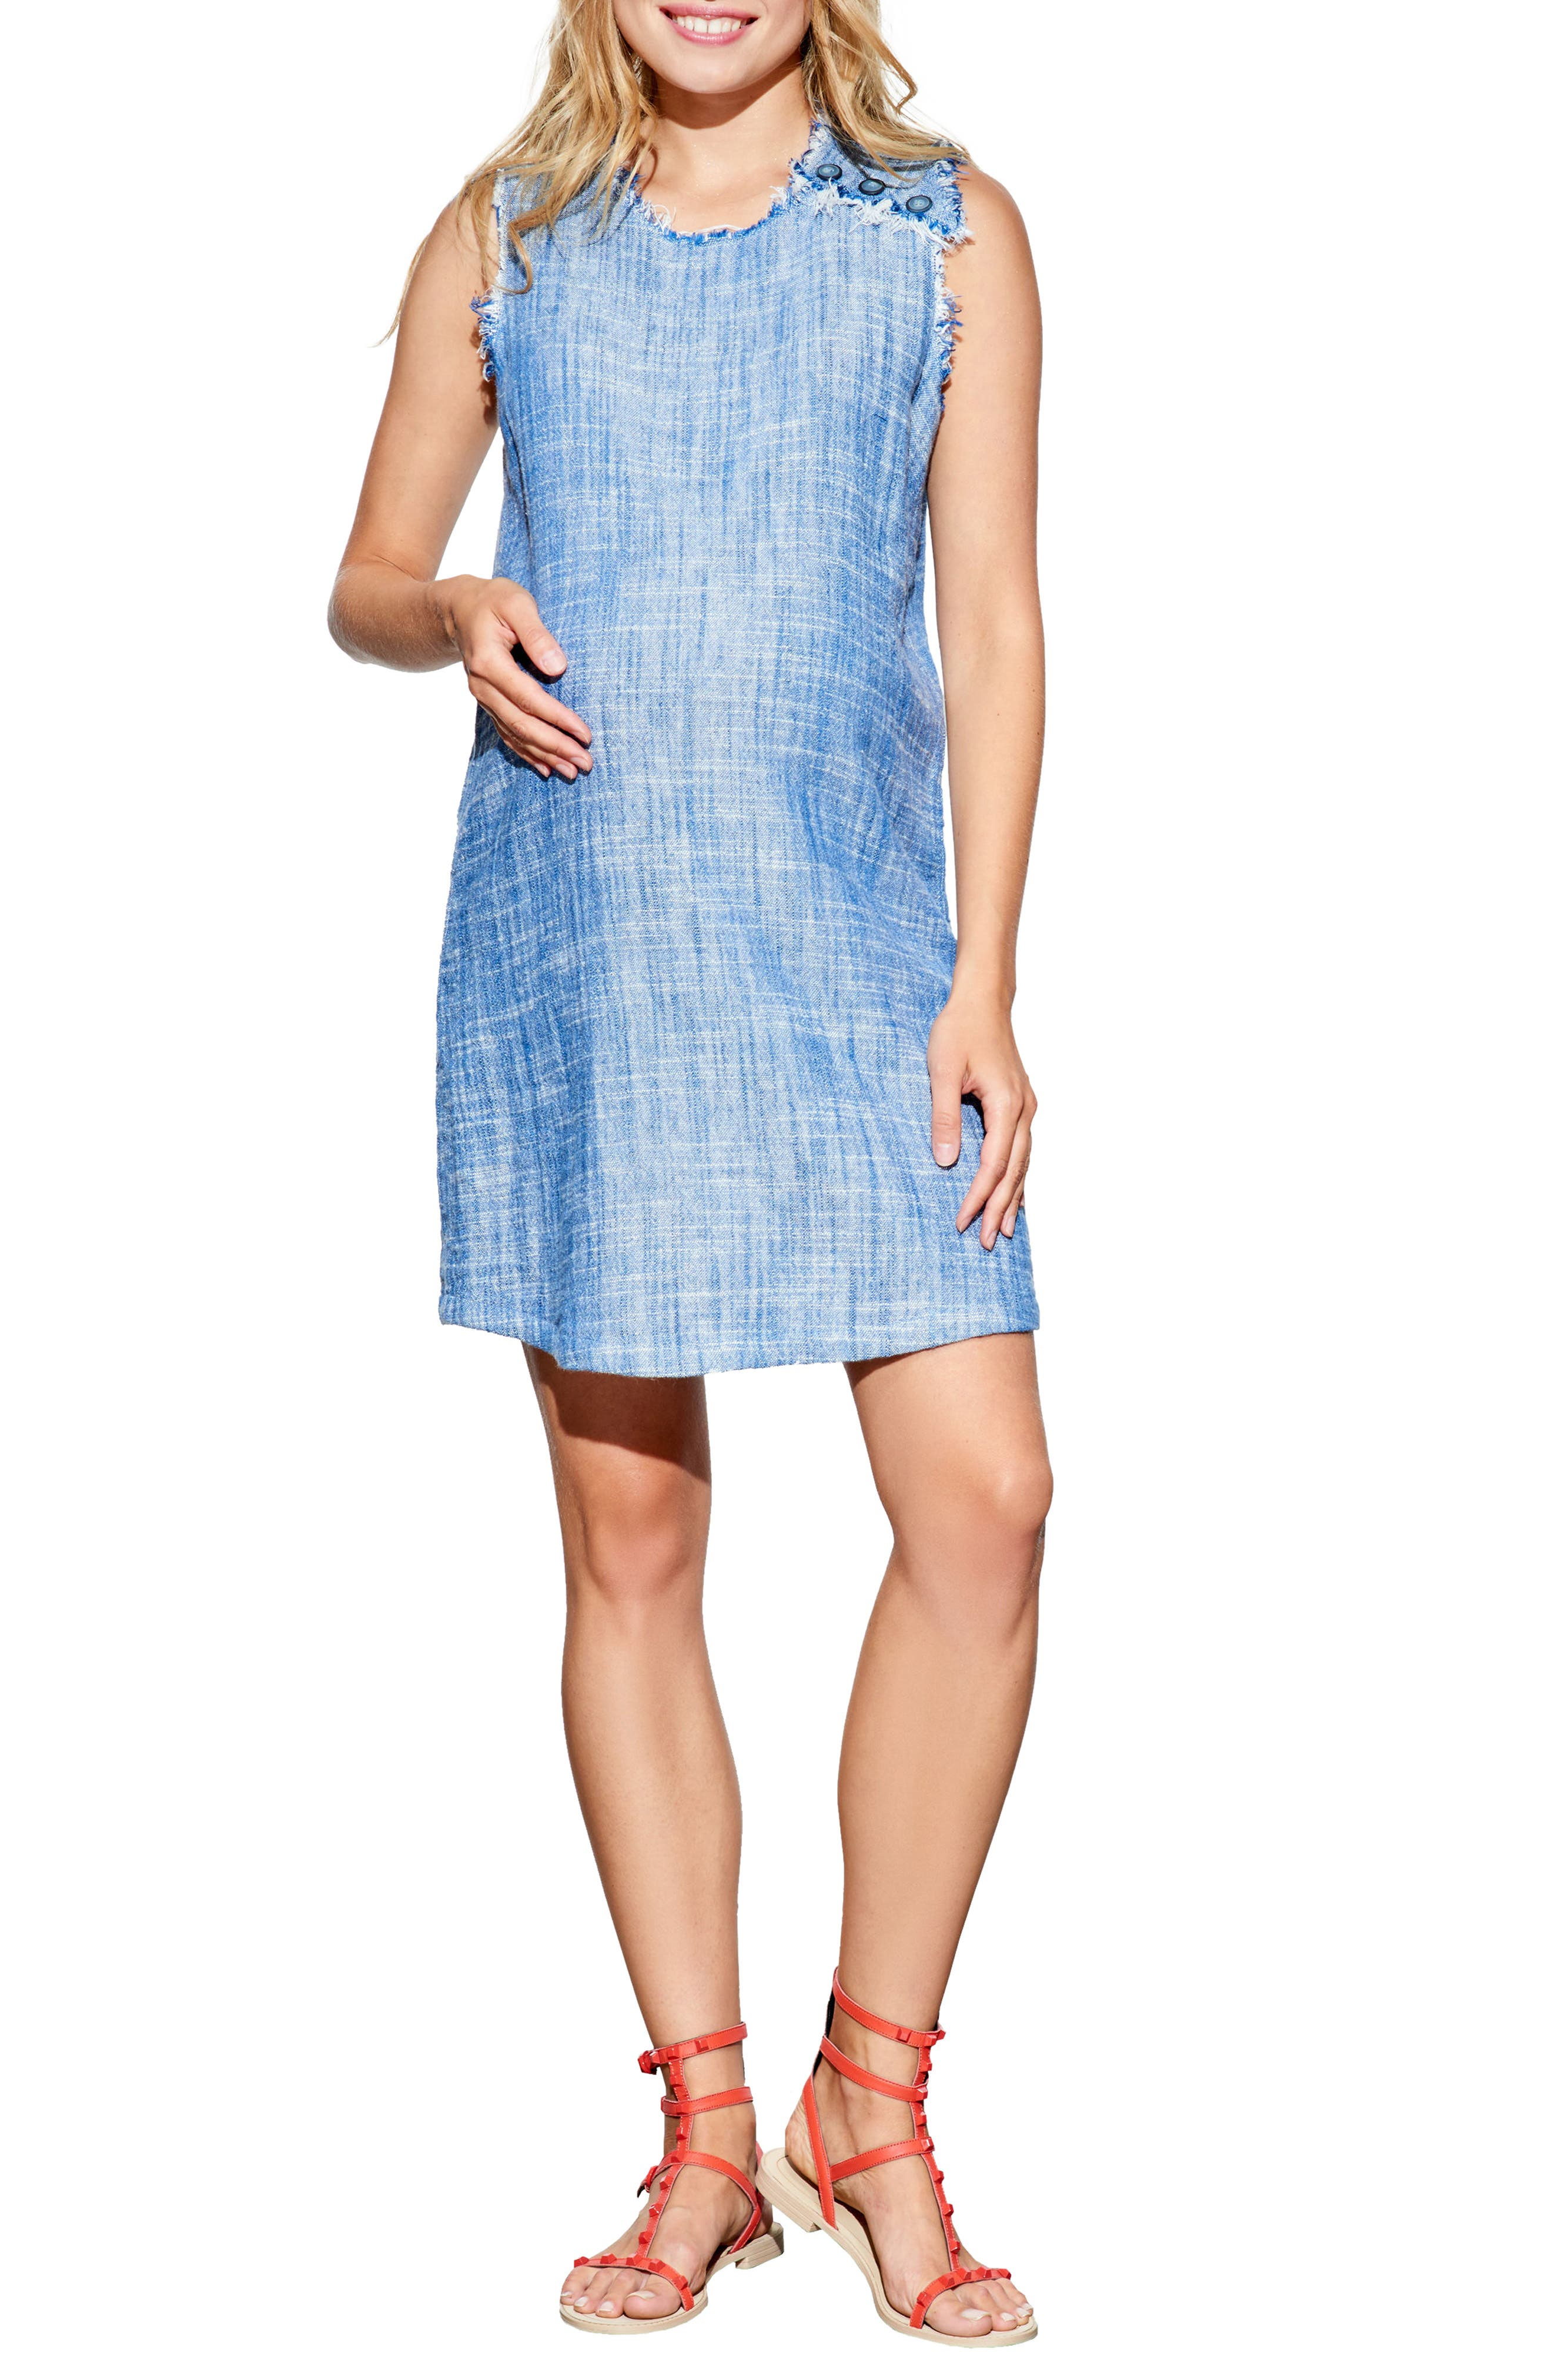 Alternate Image 1 Selected - Maternal America Sleeveless Maternity Dress